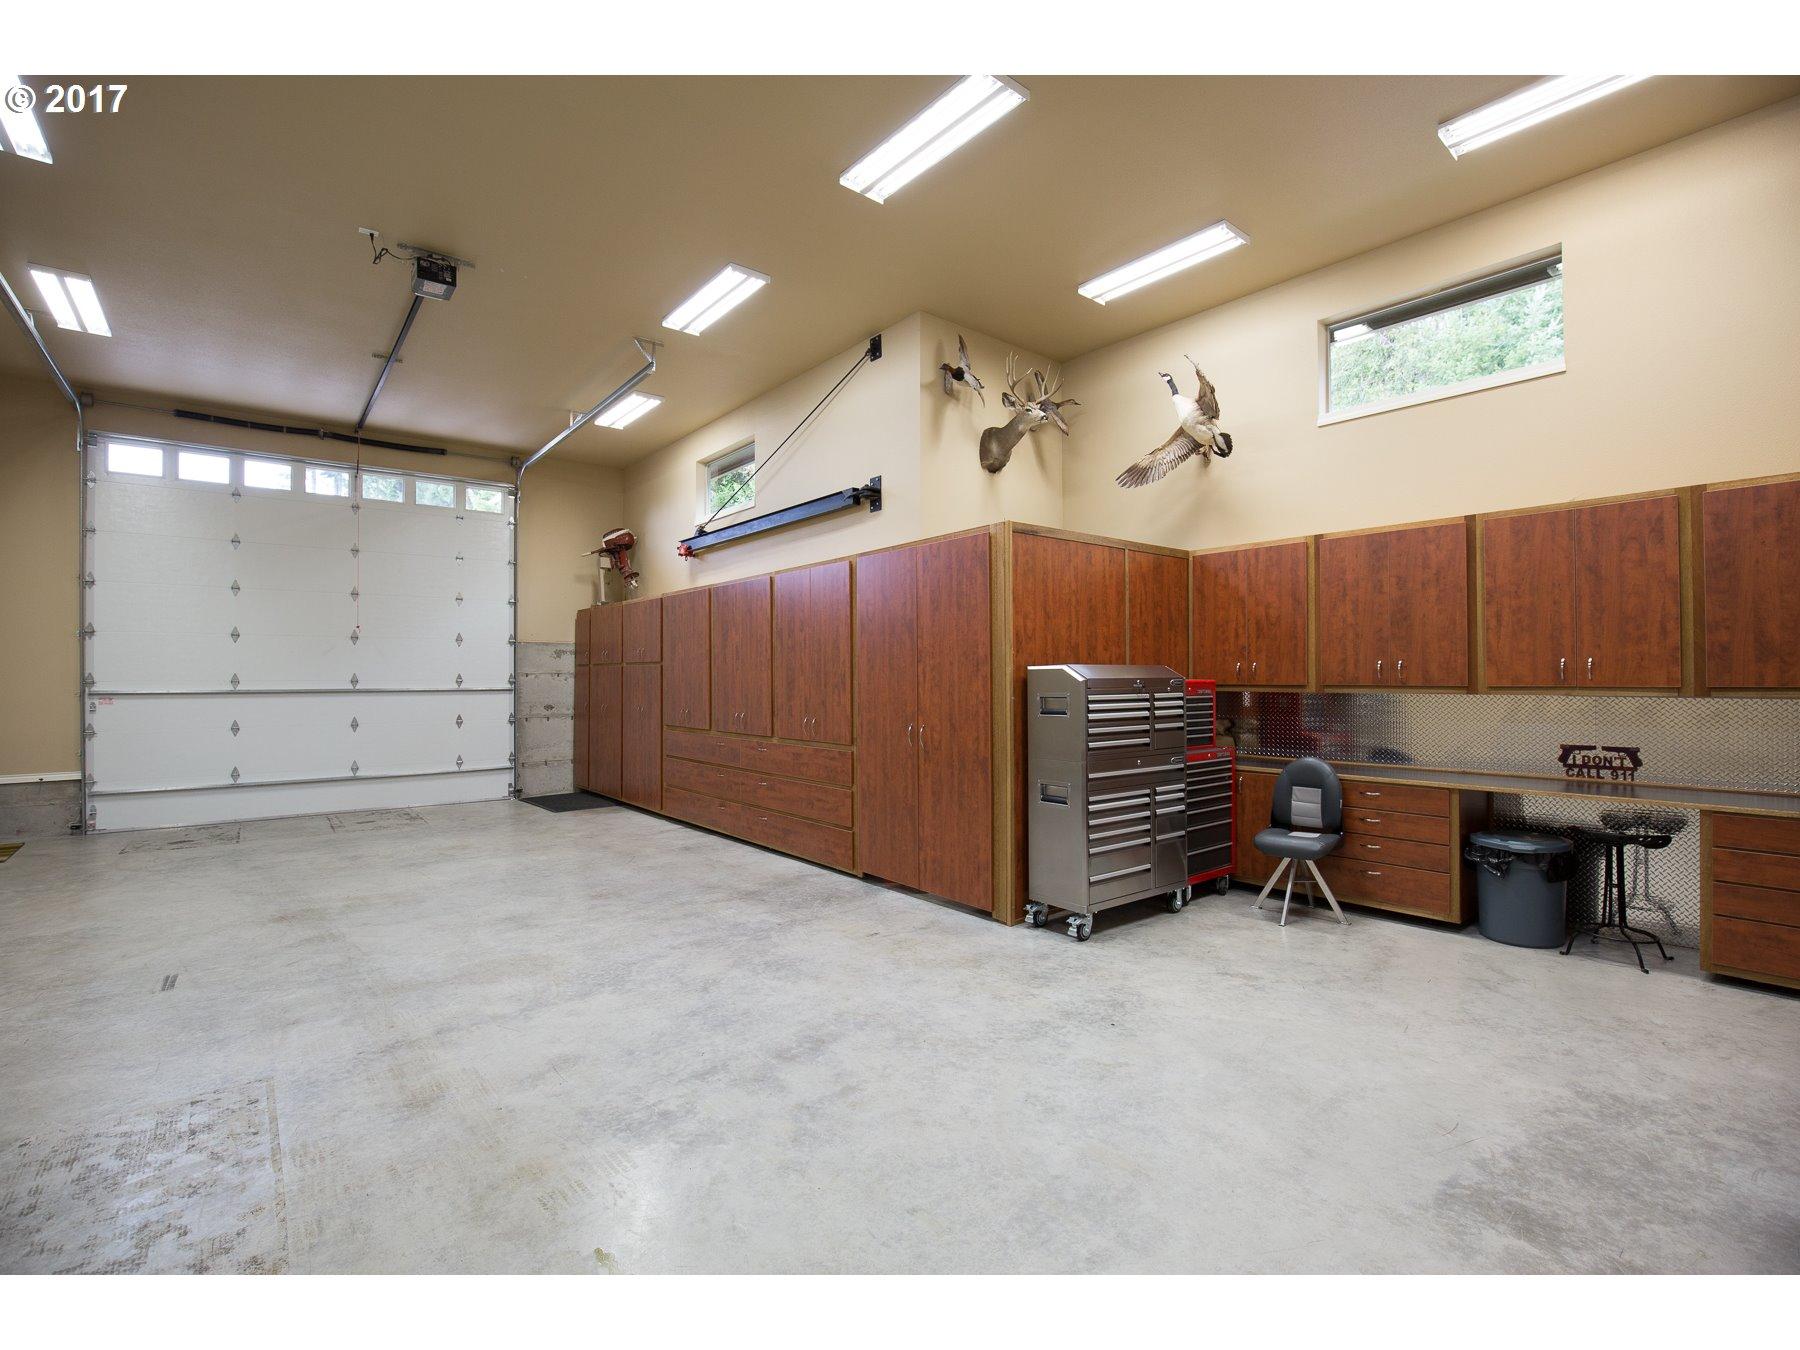 973  Confer Rd, Kalama, WA 98625